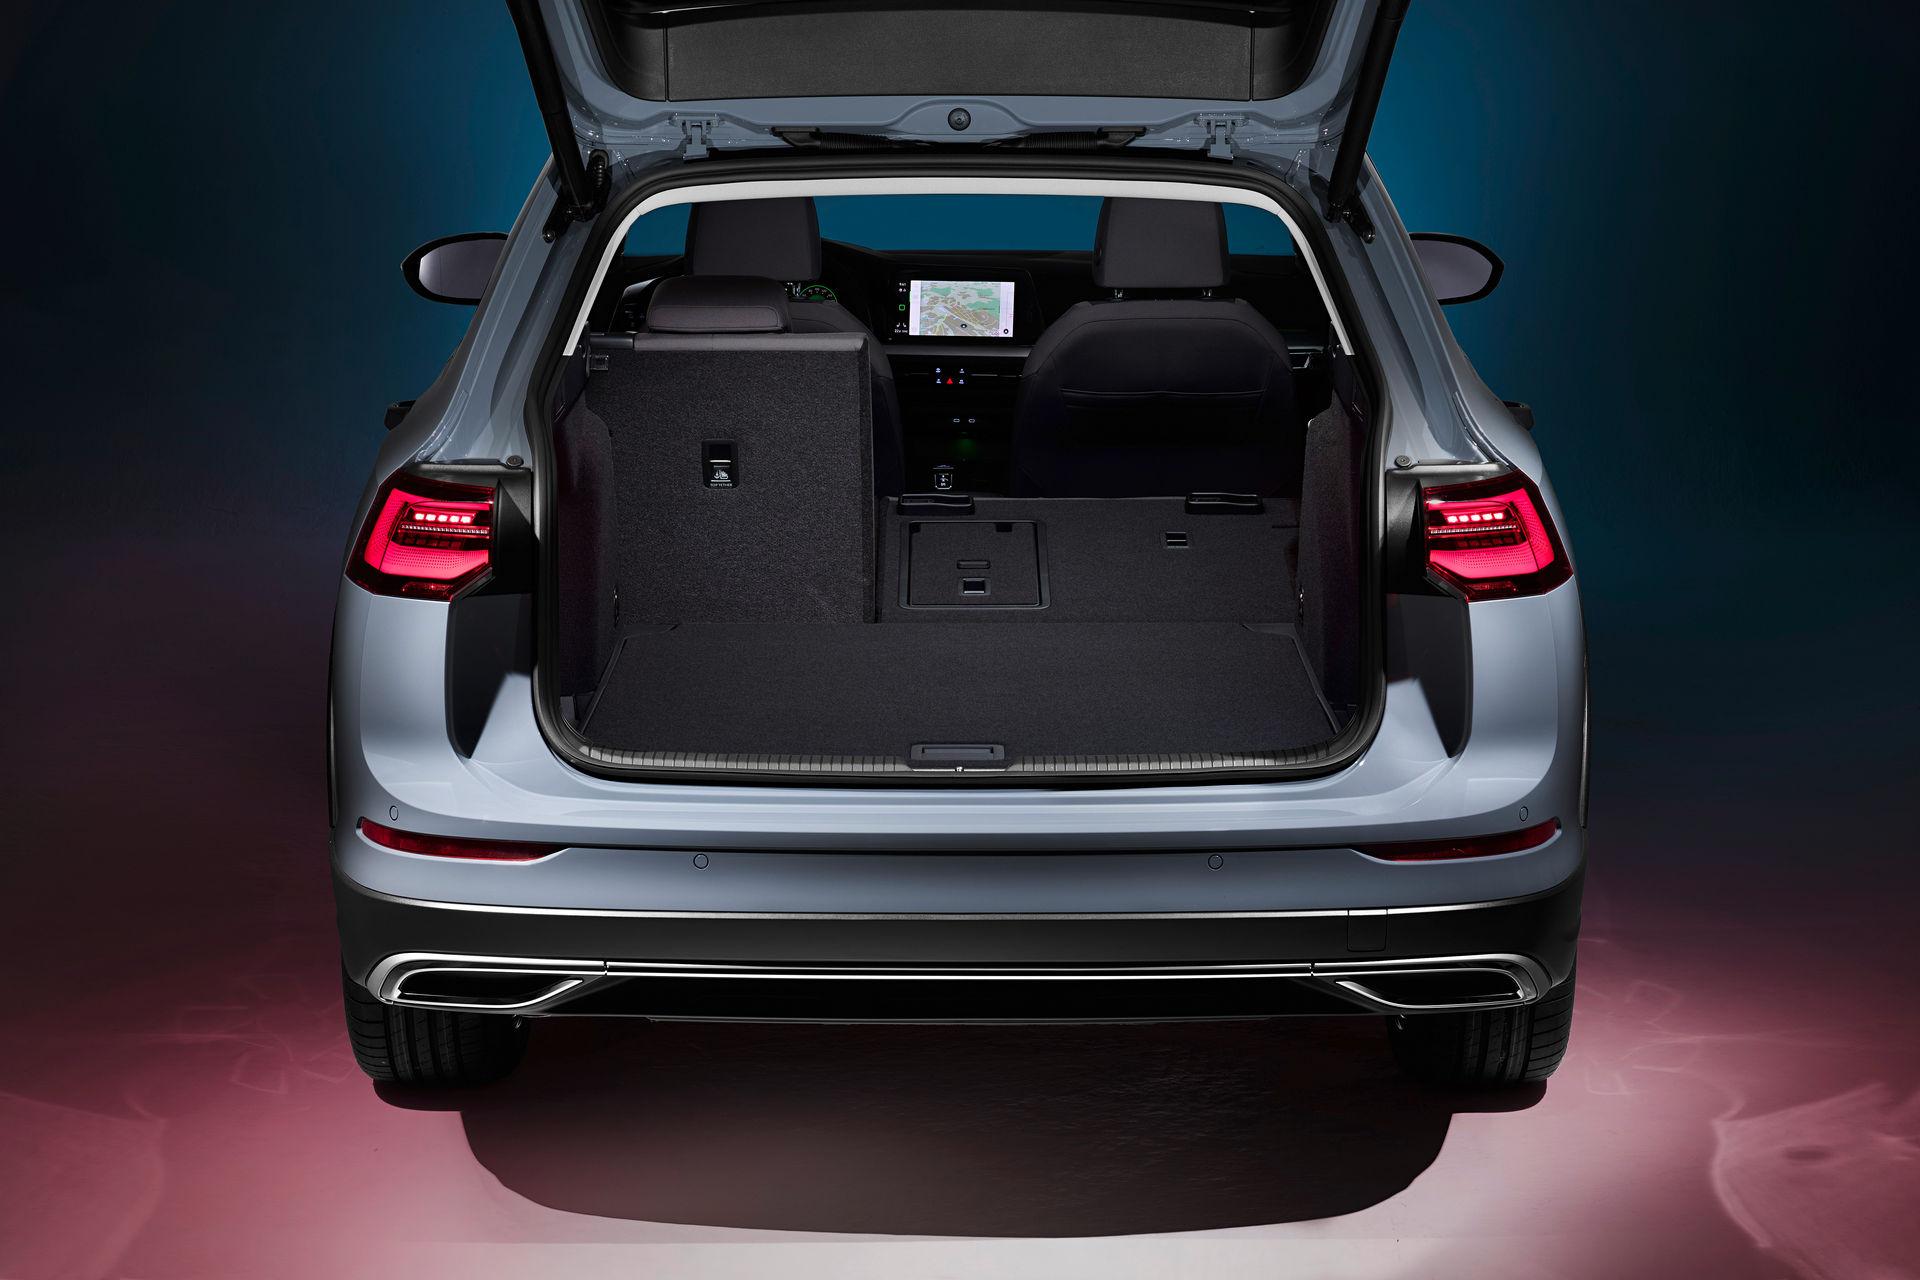 VW-Golf-Estate-And-Golf-Alltrack-10